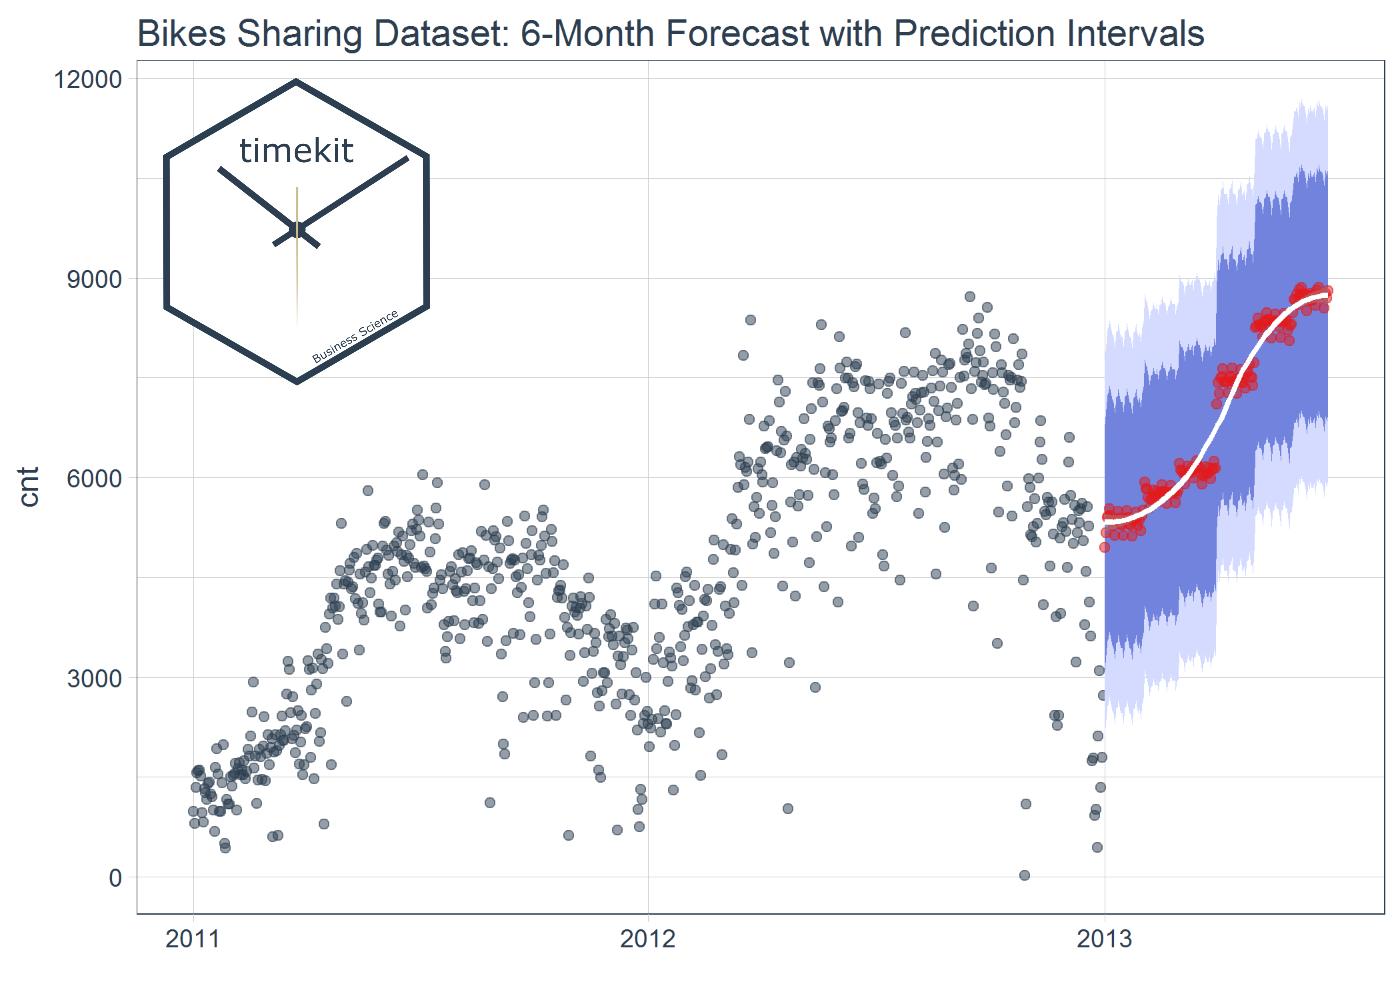 timekit: New Documentation, Function Improvements, Forecasting Vignette